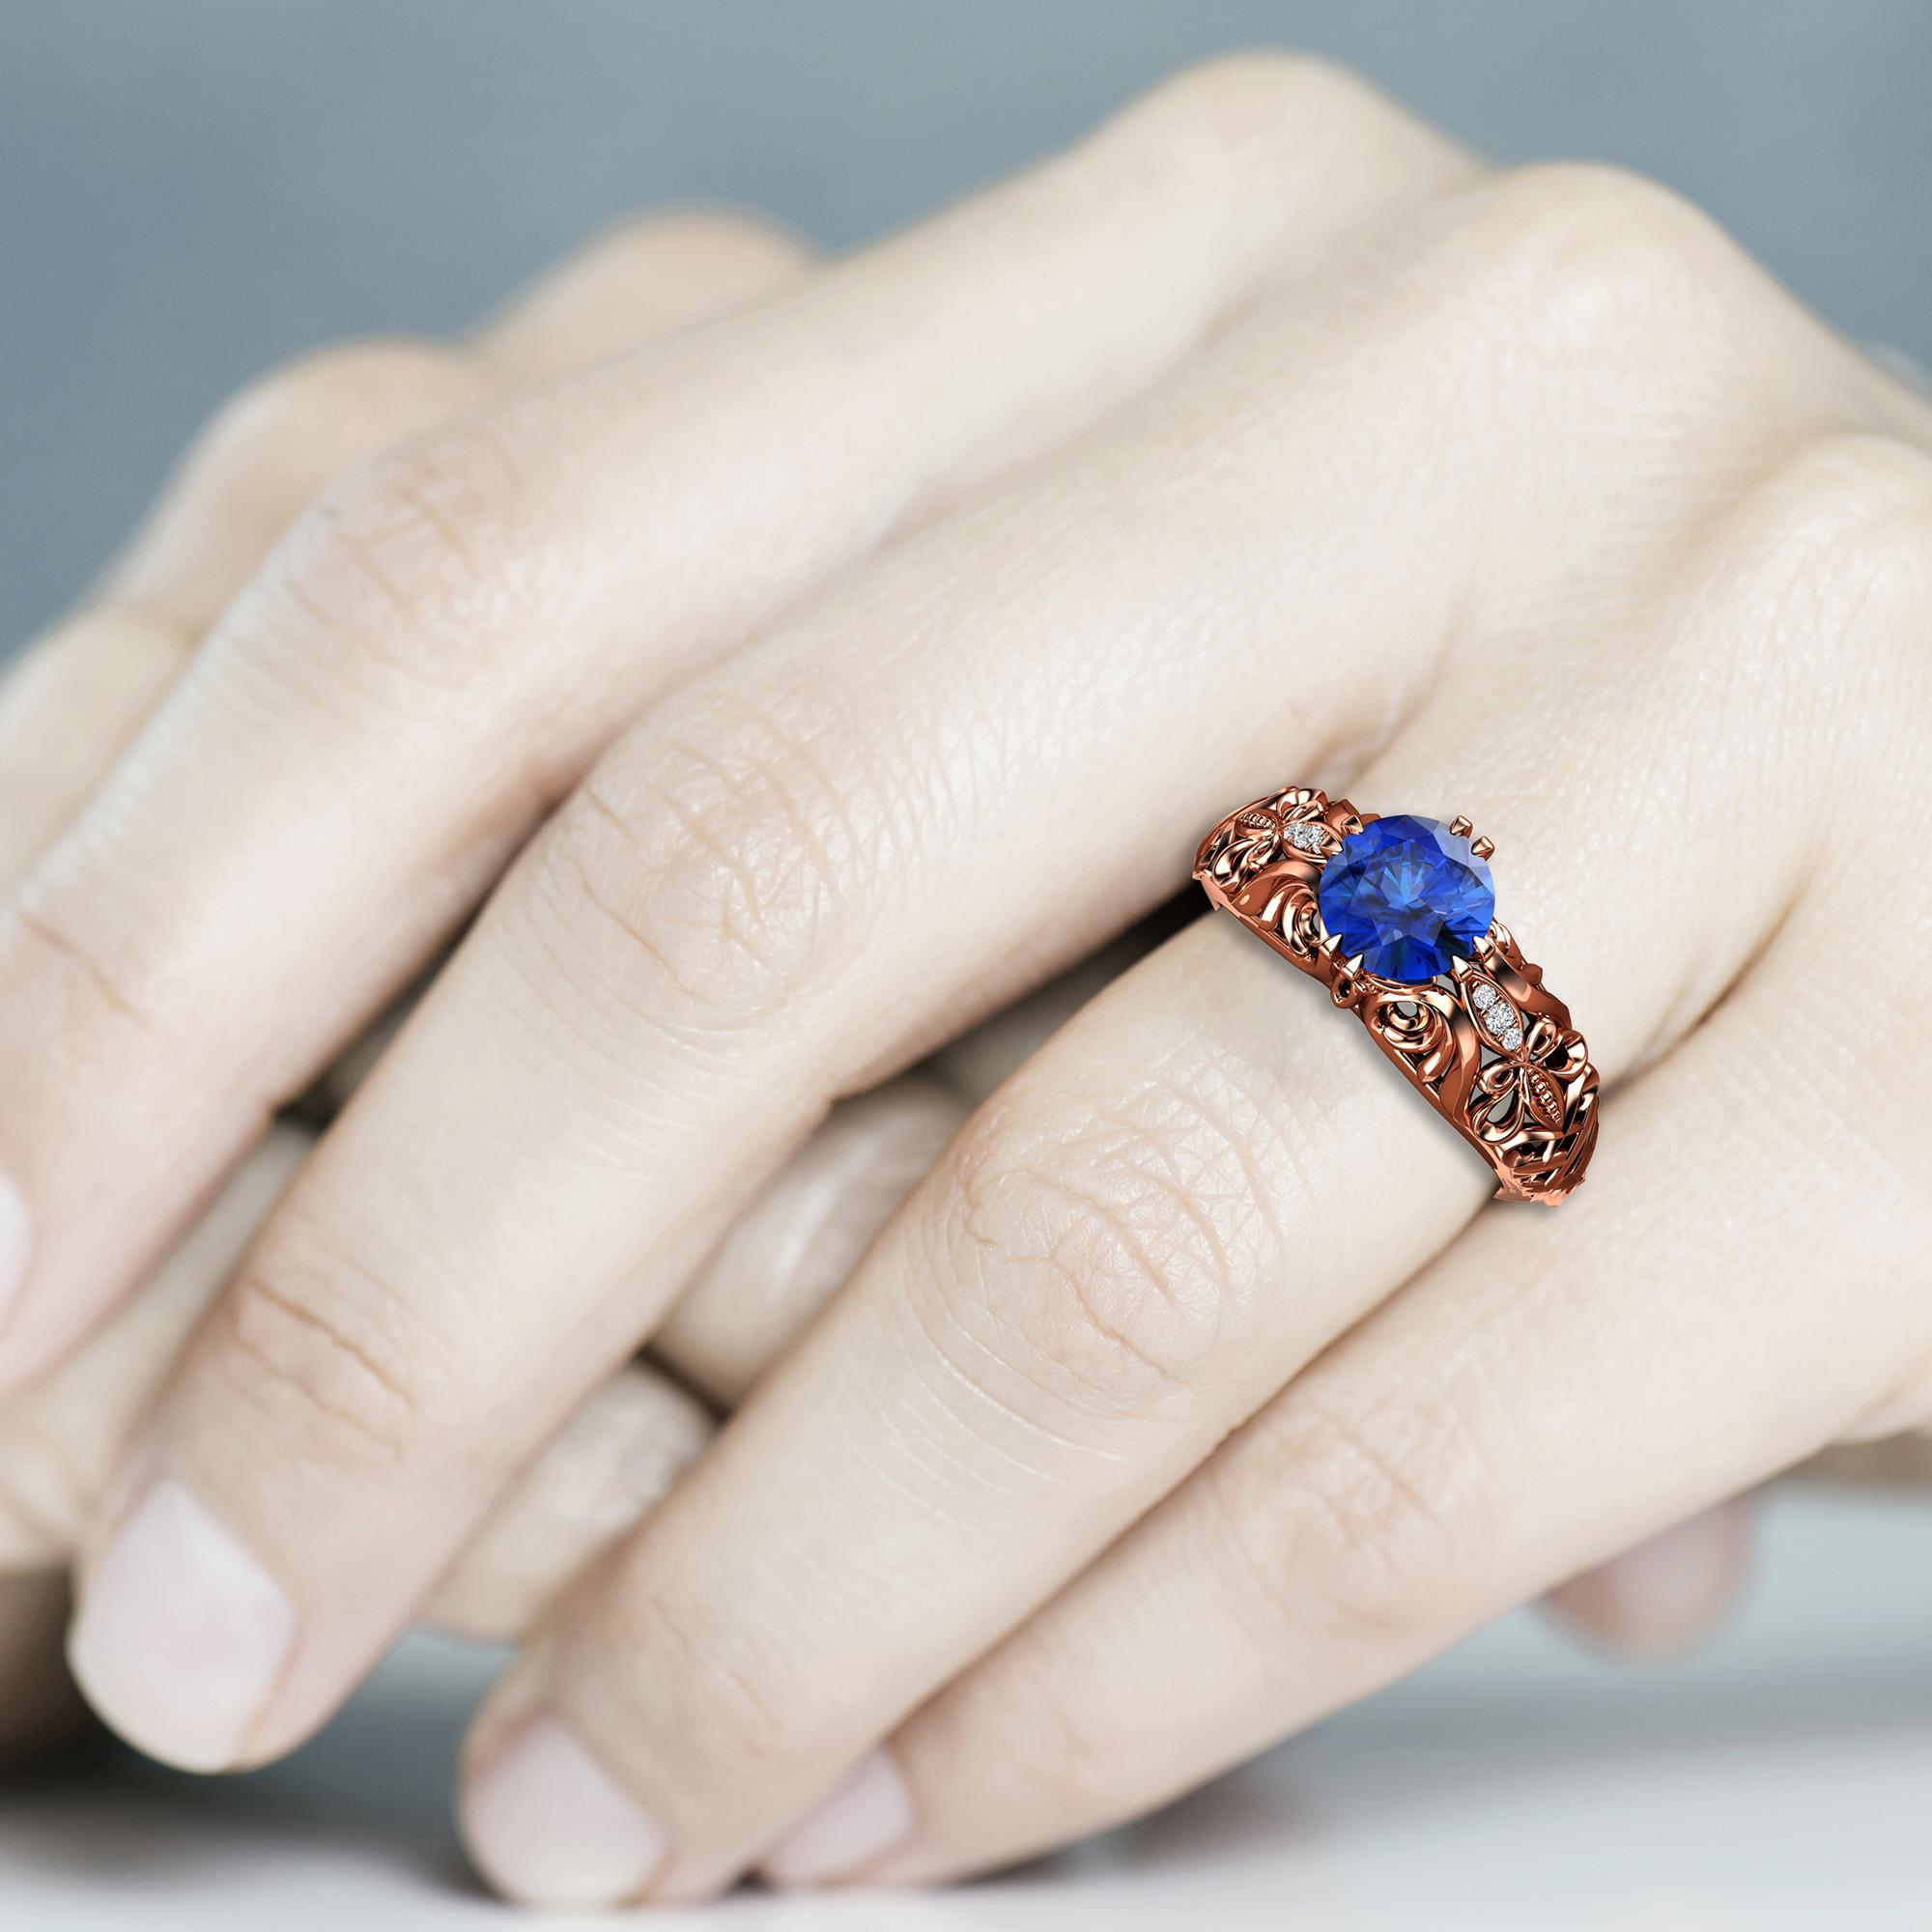 Natural Round Blue Sapphire Engagement Ring 14K Rose Gold Ring 1.5 Carat Sapphire Bridal Ring